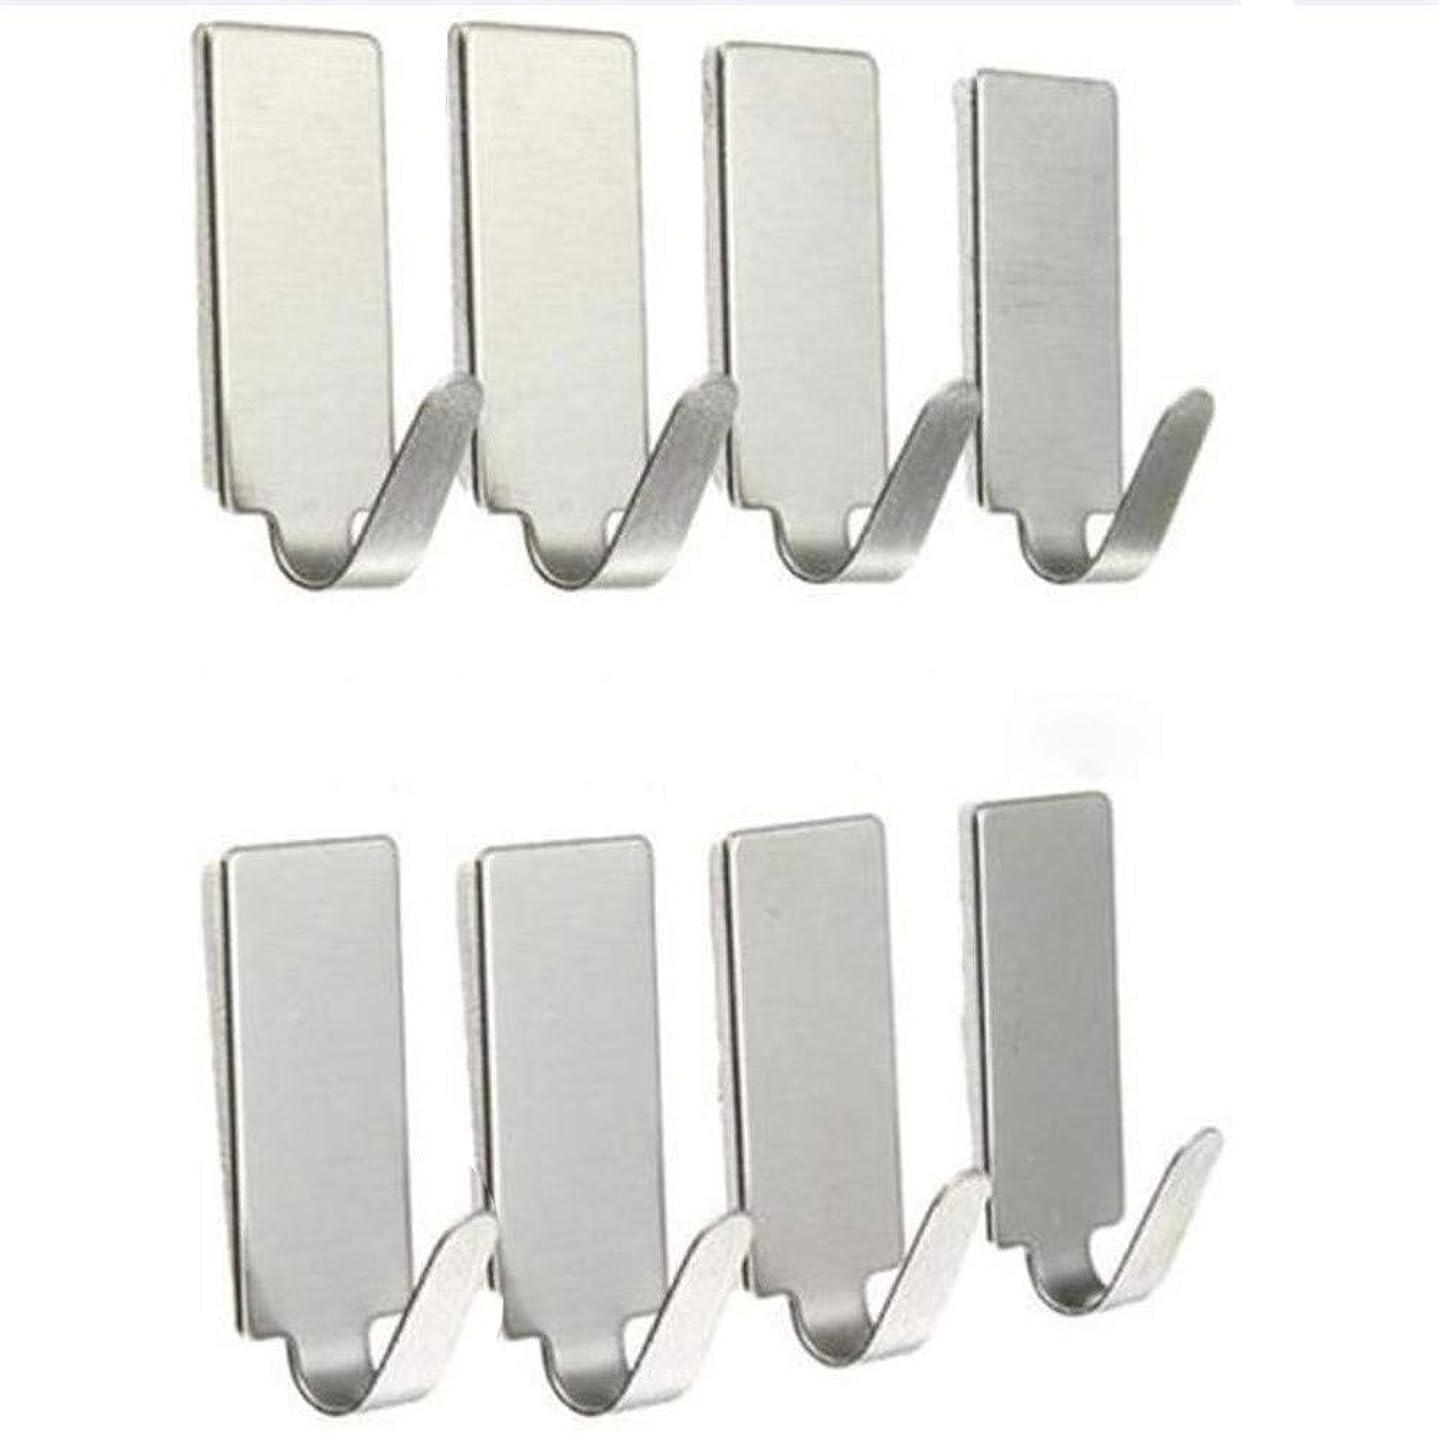 Fan-Ling 6/8/12 PCS Self Adhesive Stainless Steel Holder Hook Hanger,Home Kitchen Wall Door Hook,Utility Hooks (8)